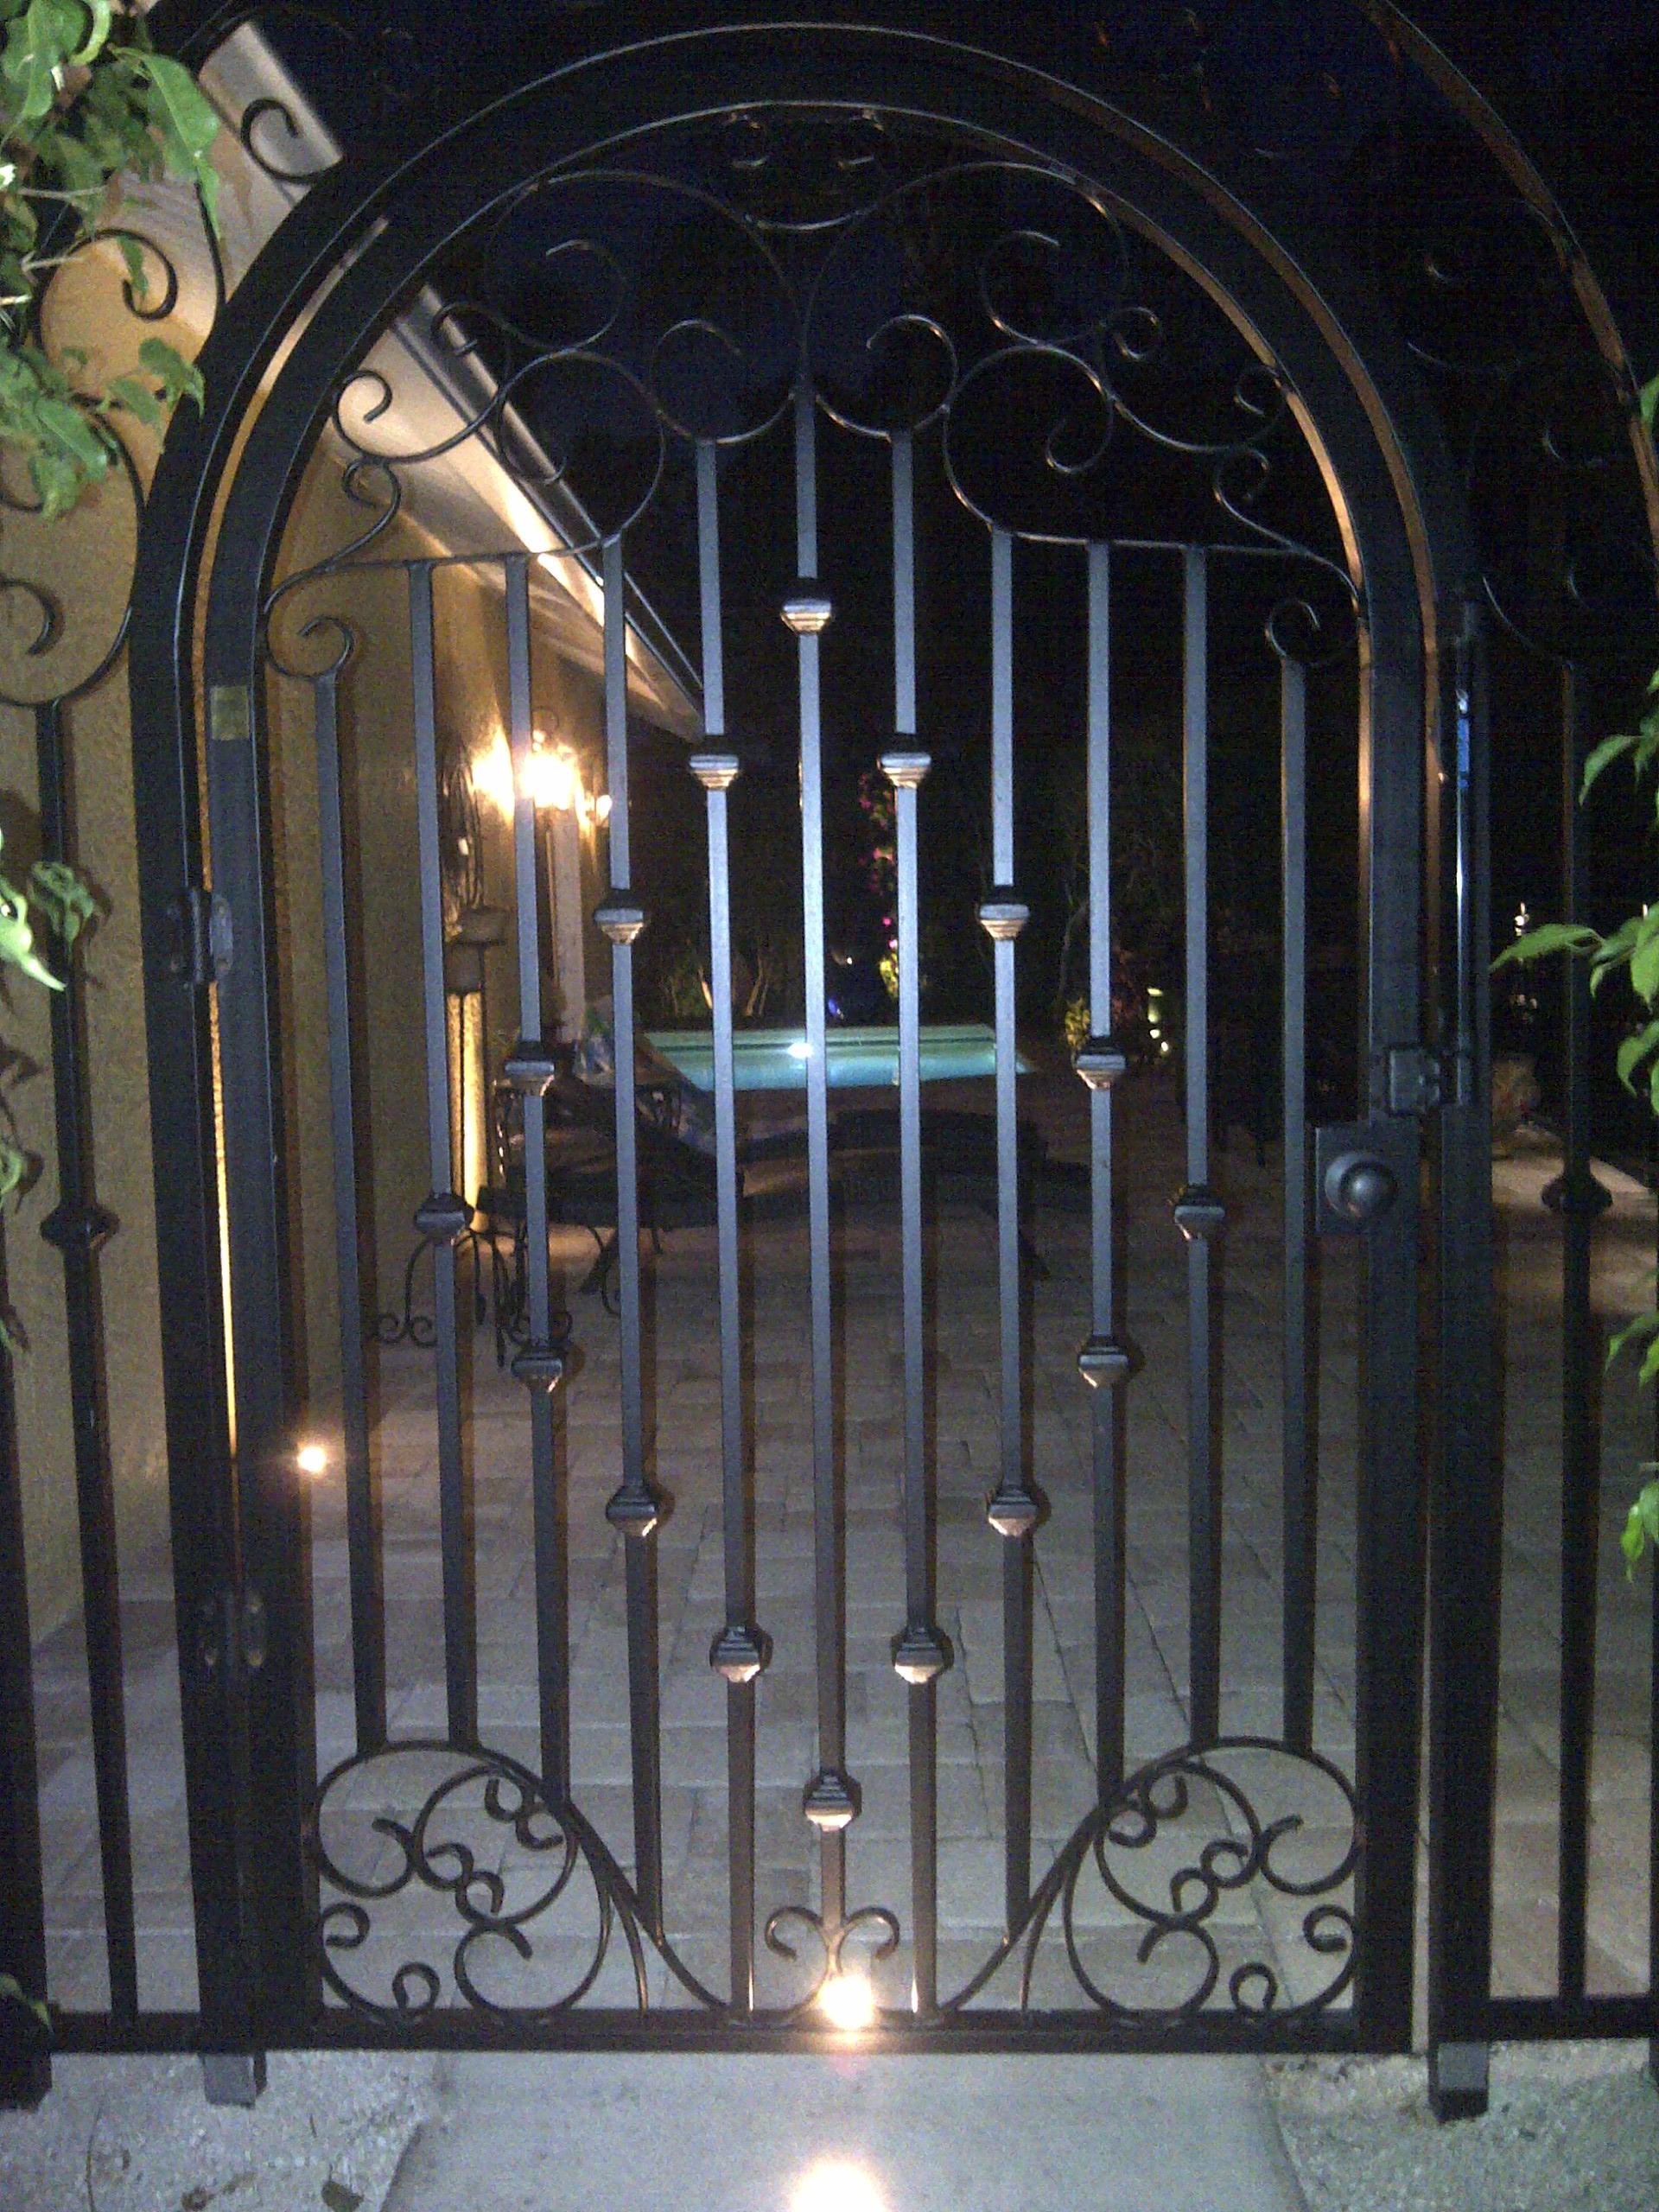 Wrought Iron Gate Hardware Posts Latches Locks Hinges